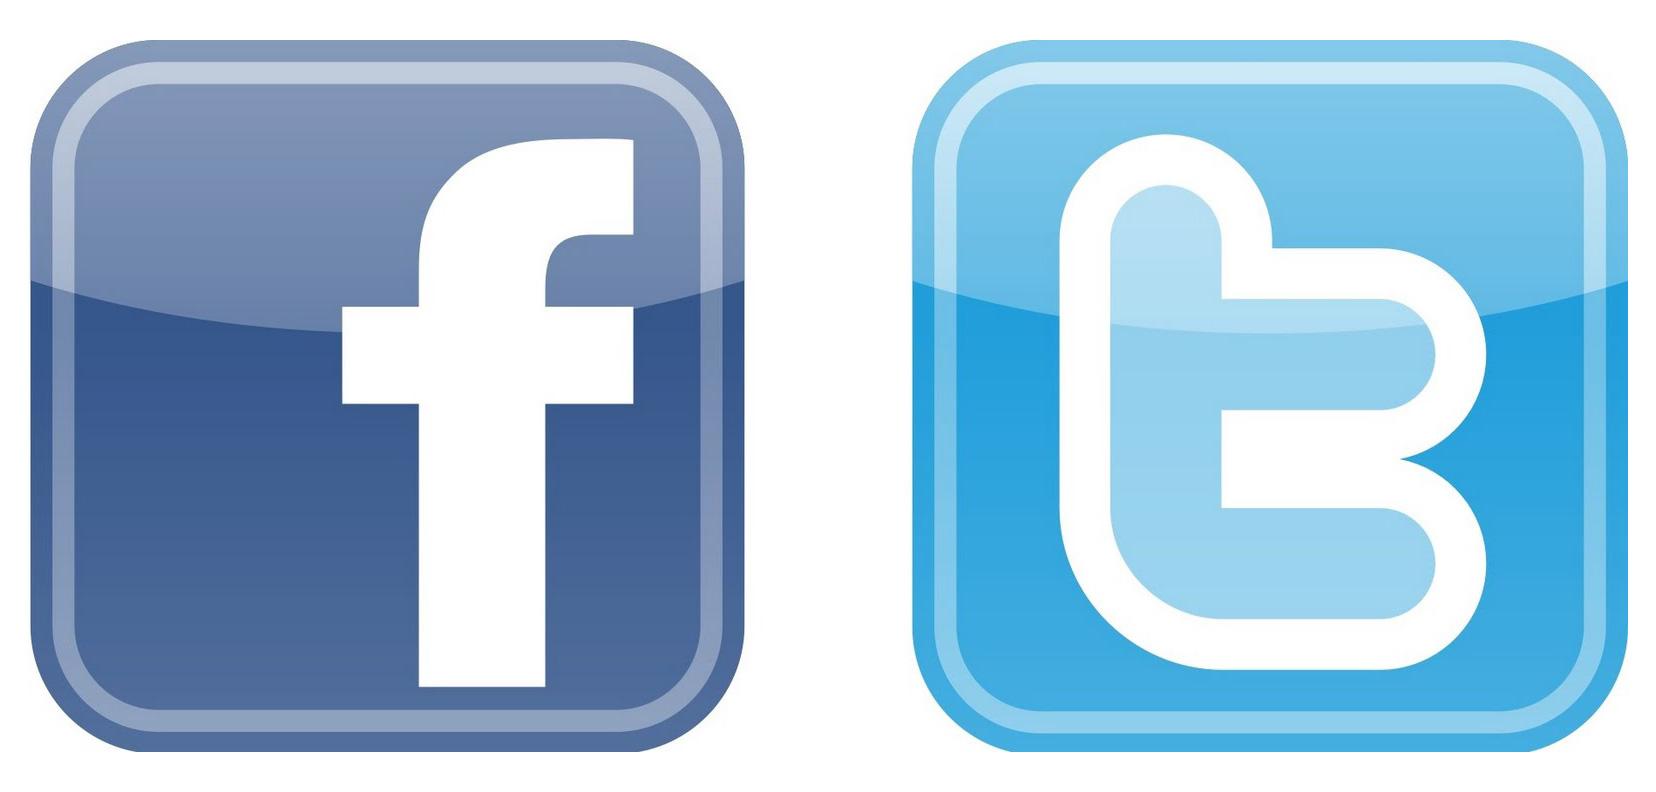 Fb Vector Logo - ClipArt Best : best logo designs : Best Logo Design